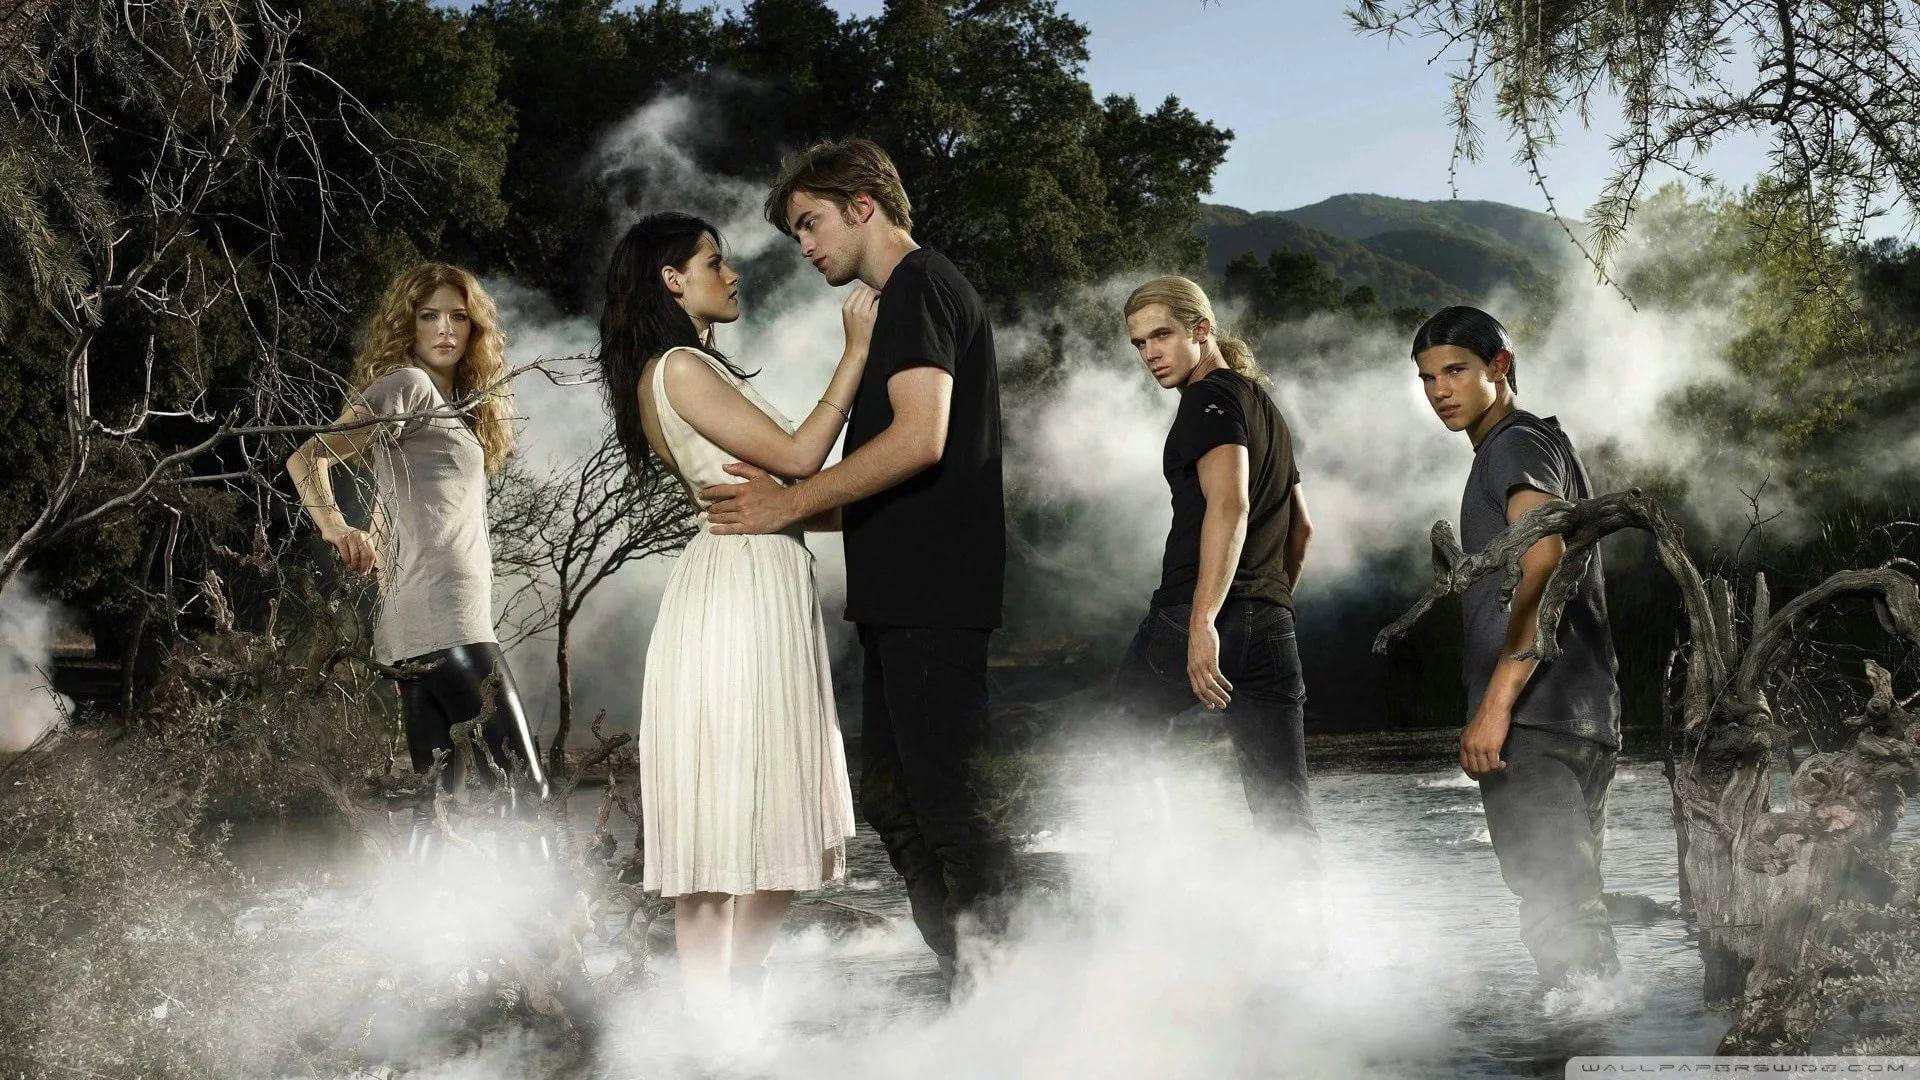 Twilight Saga wallpaper download